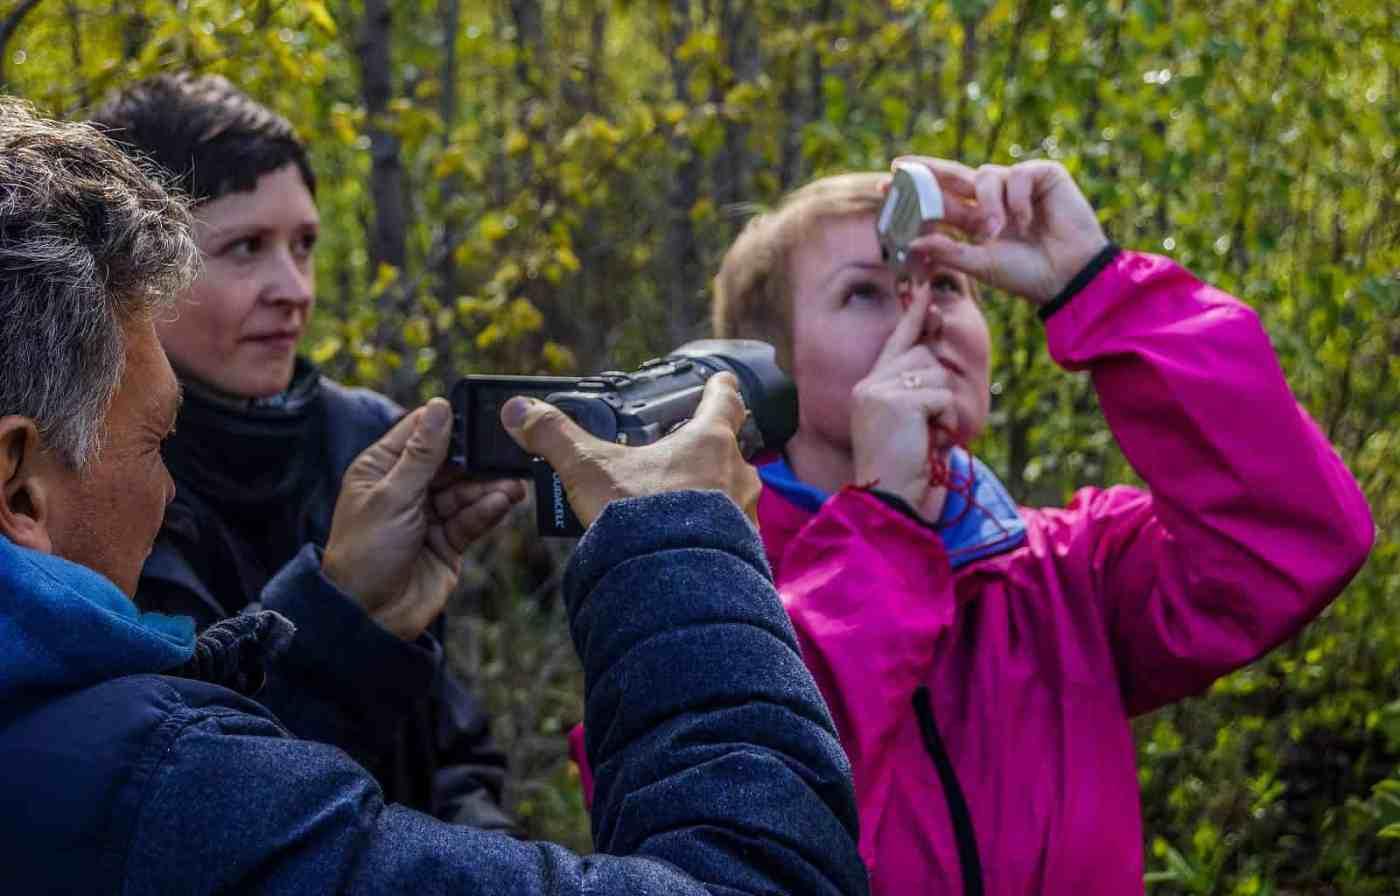 Archangelsk-21886.JPG - © European Wilderness Society CC BY-NC-ND 4.0